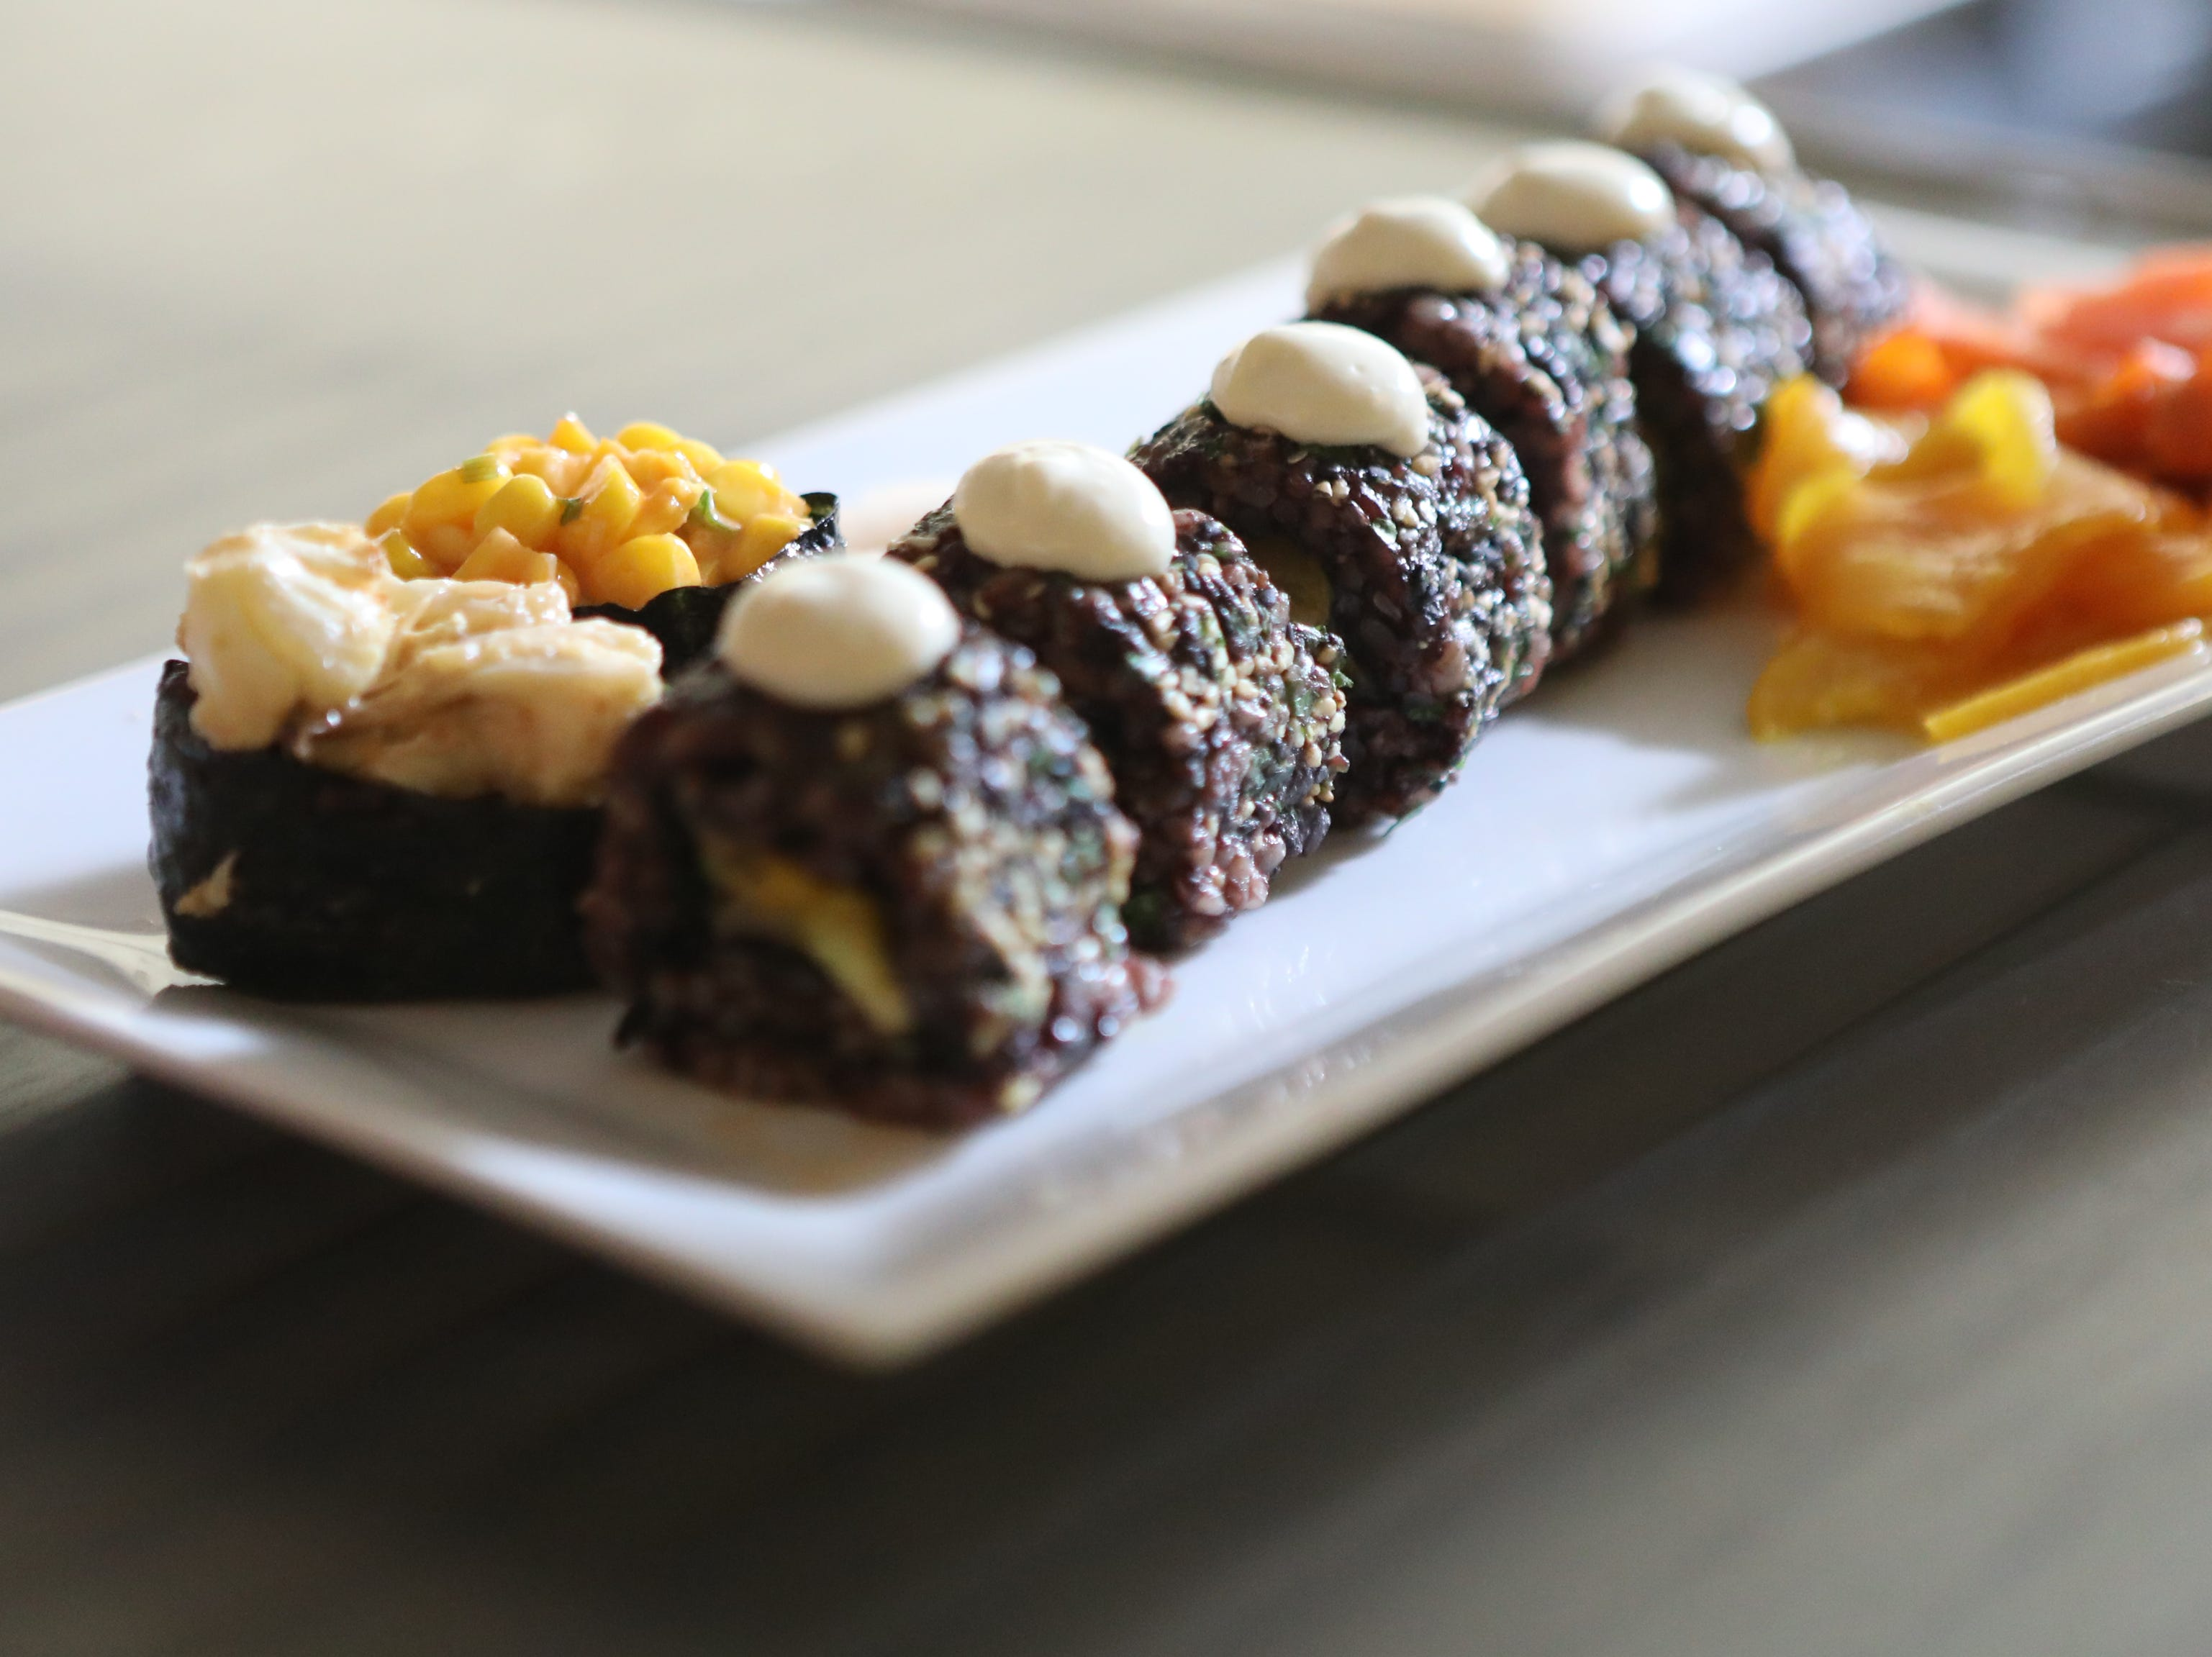 The vegan maki roll, sashimi and gunkan maki are ready to serve.